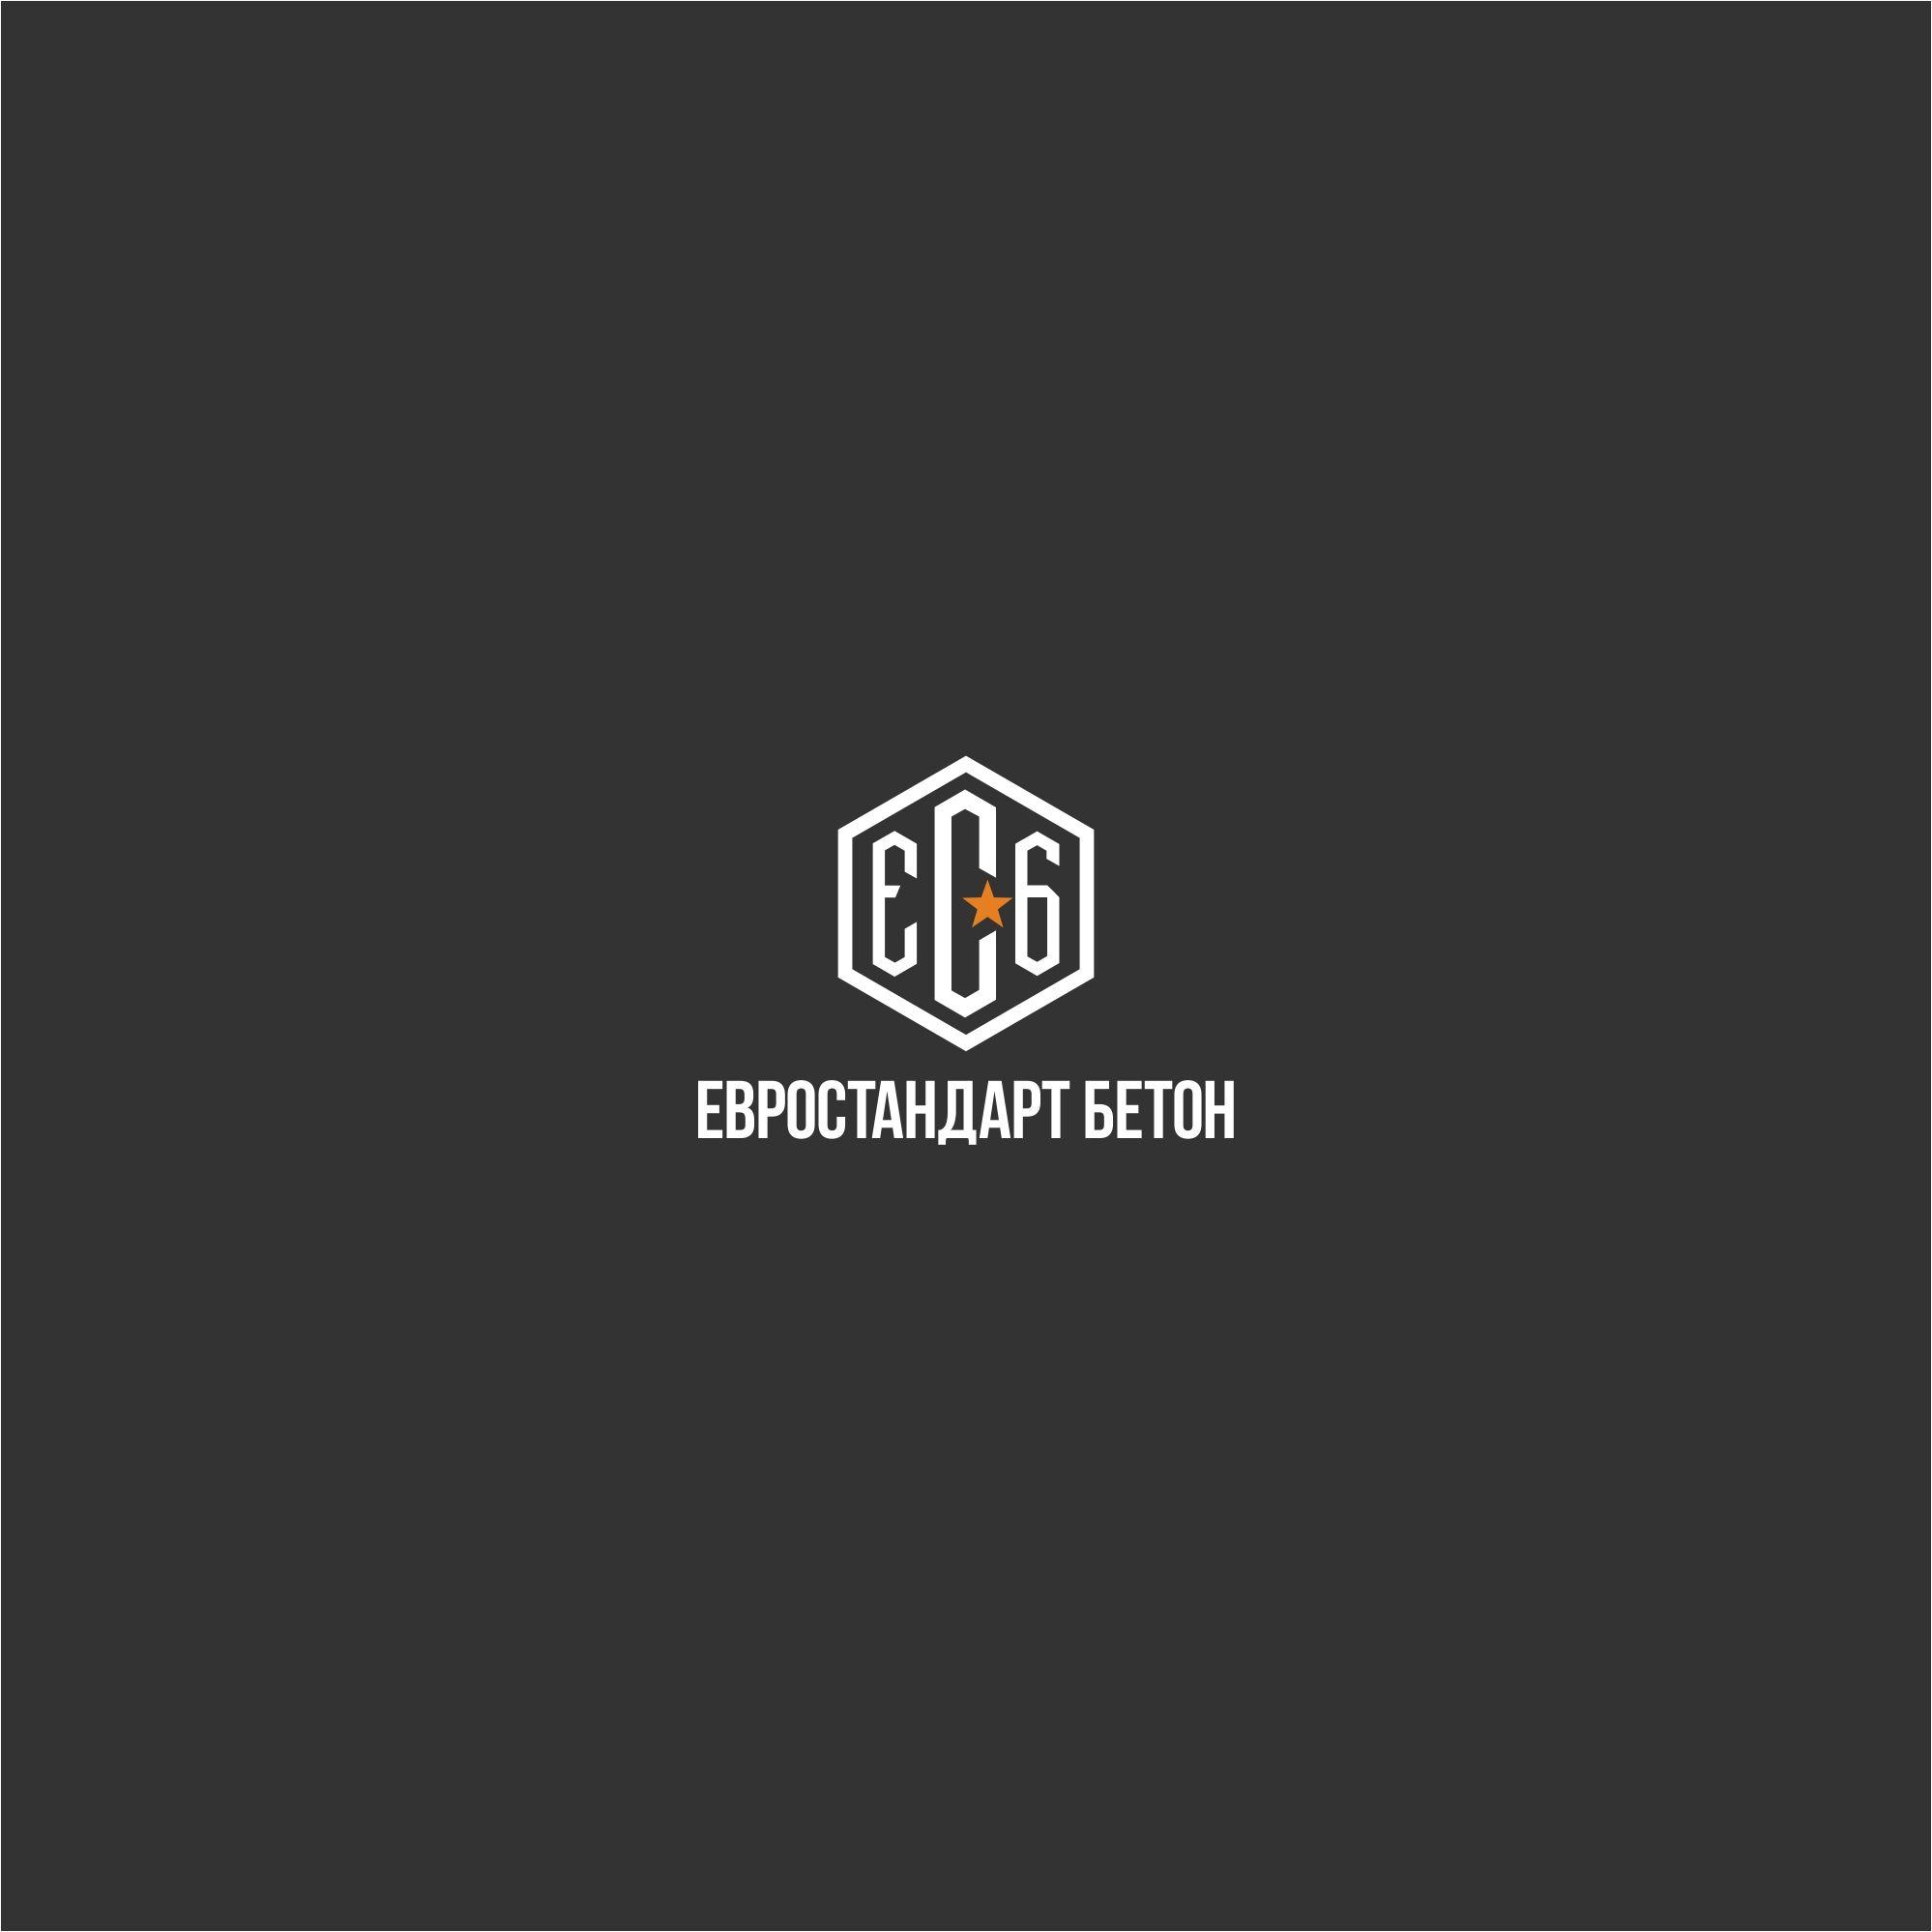 Логотип для ЕвроСтандарт Бетон - дизайнер serz4868